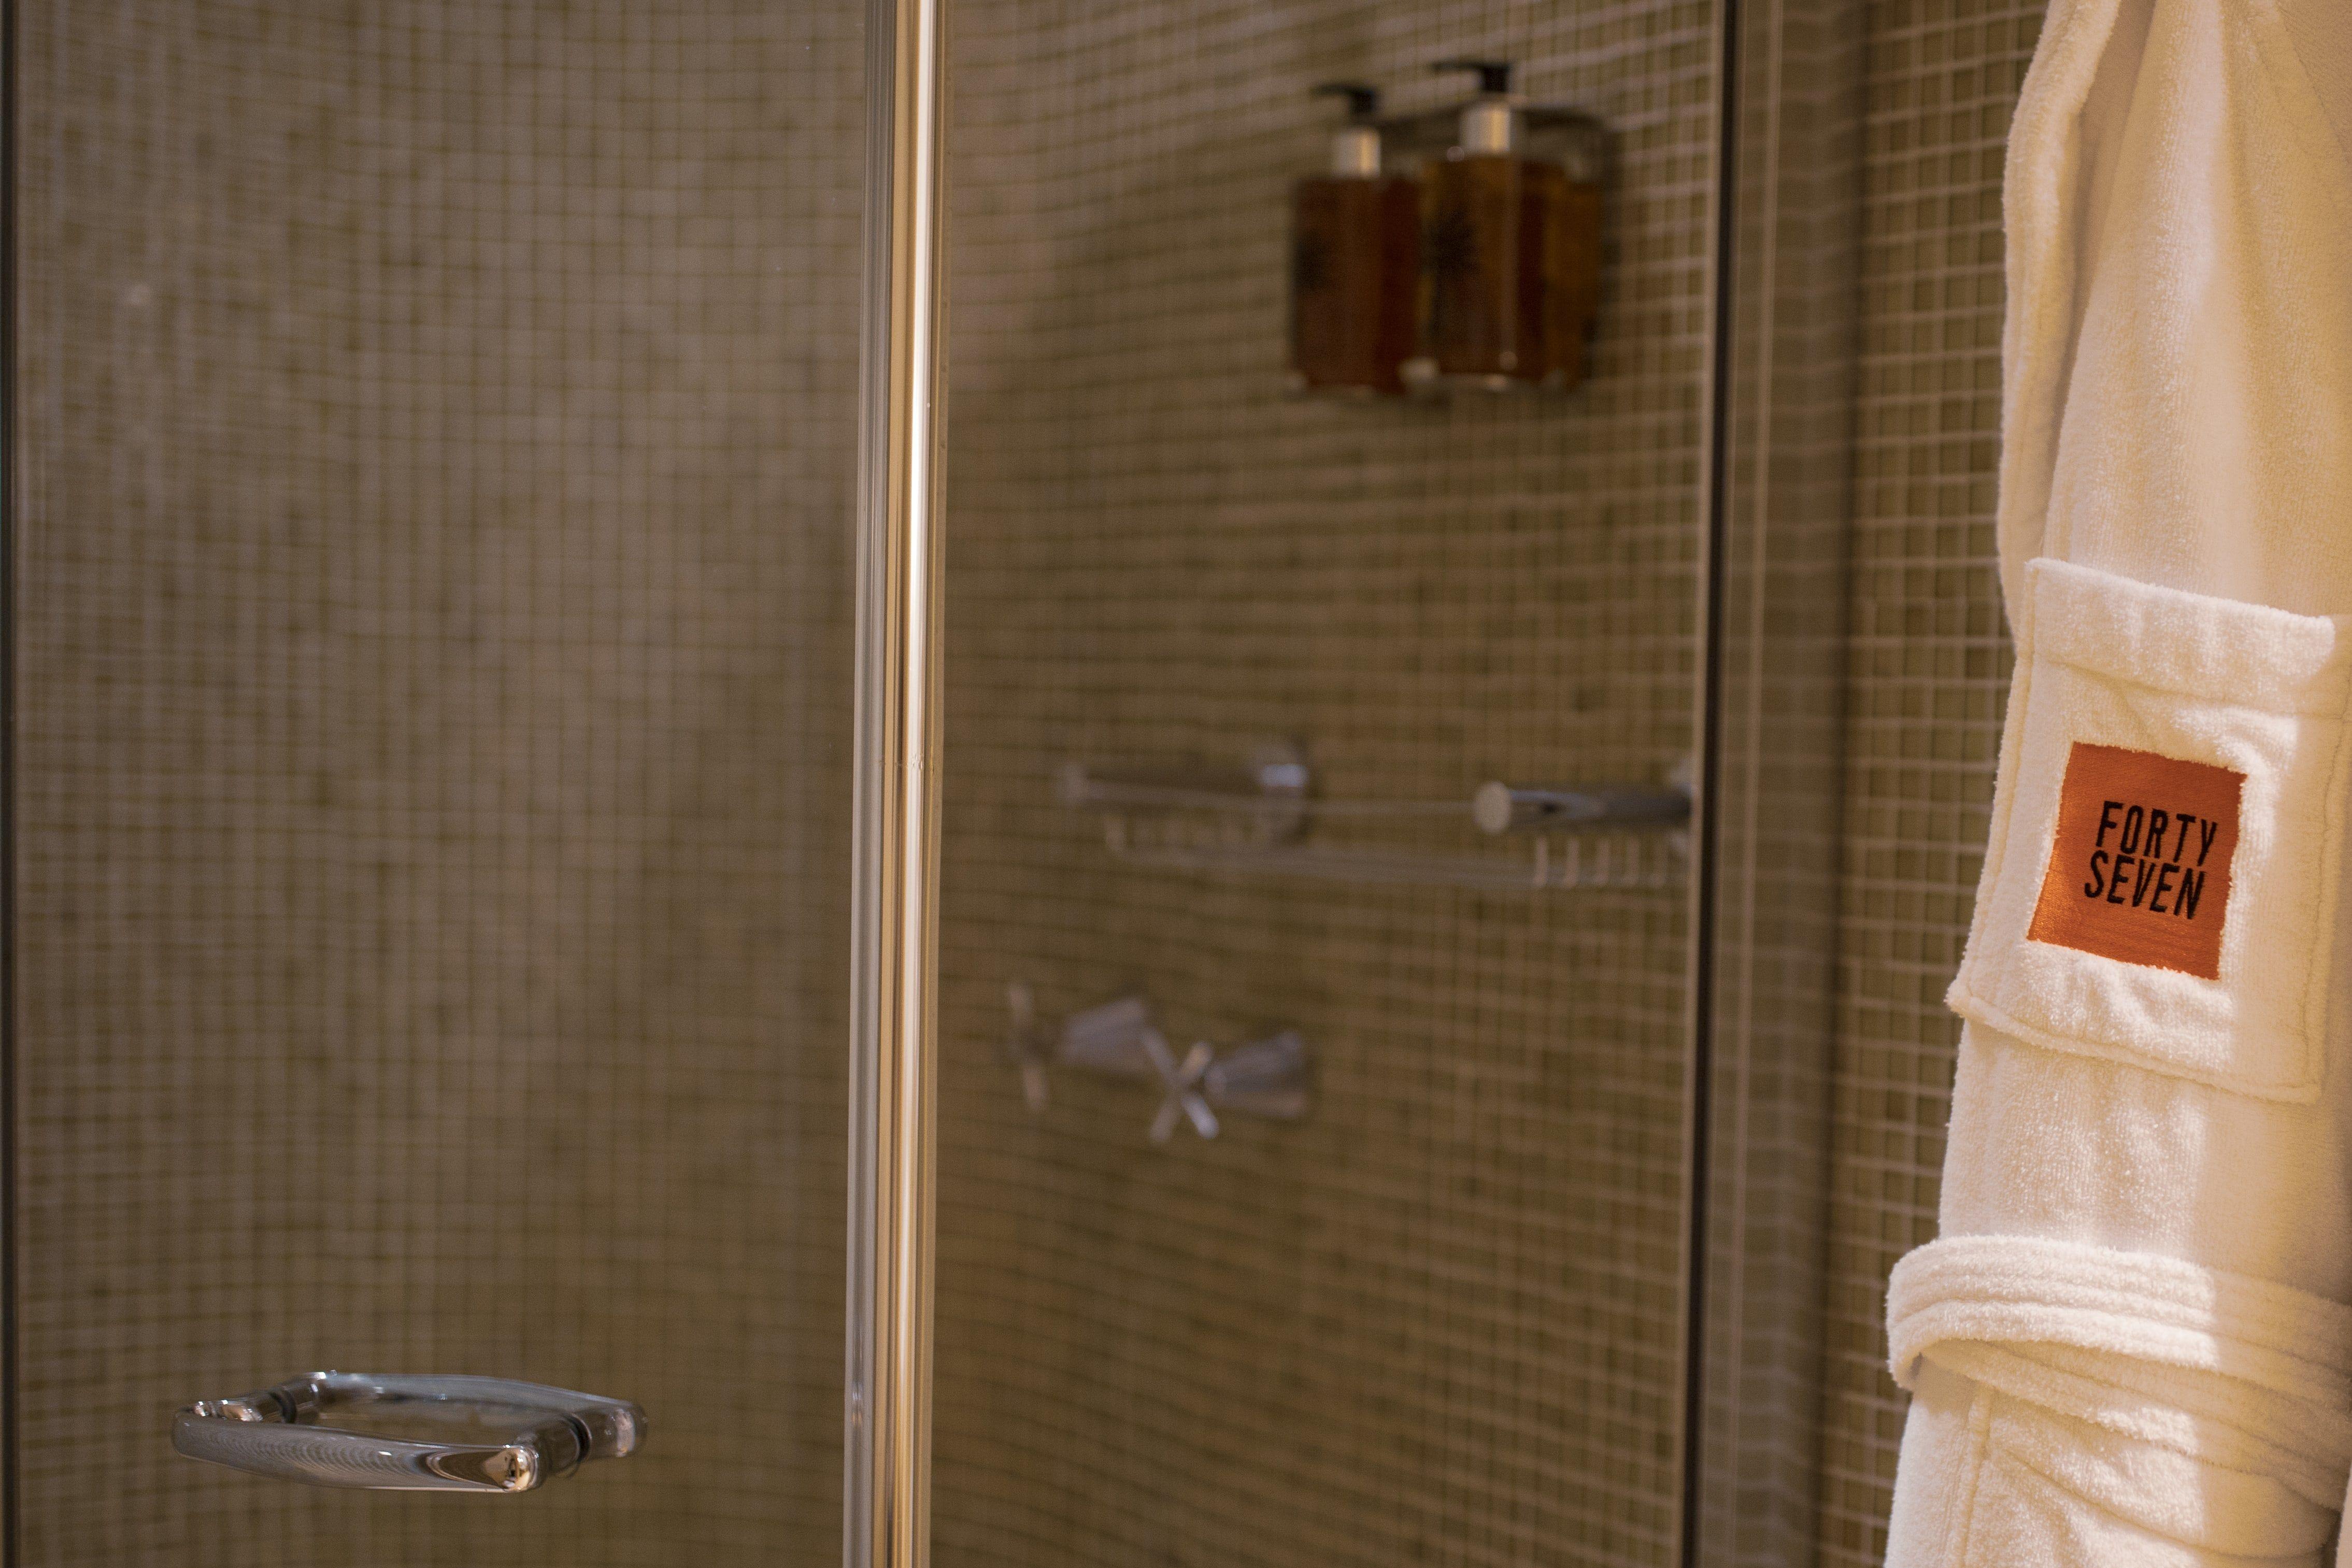 #Details #Shower #47Boutiquehotel #Fortysevenhotel